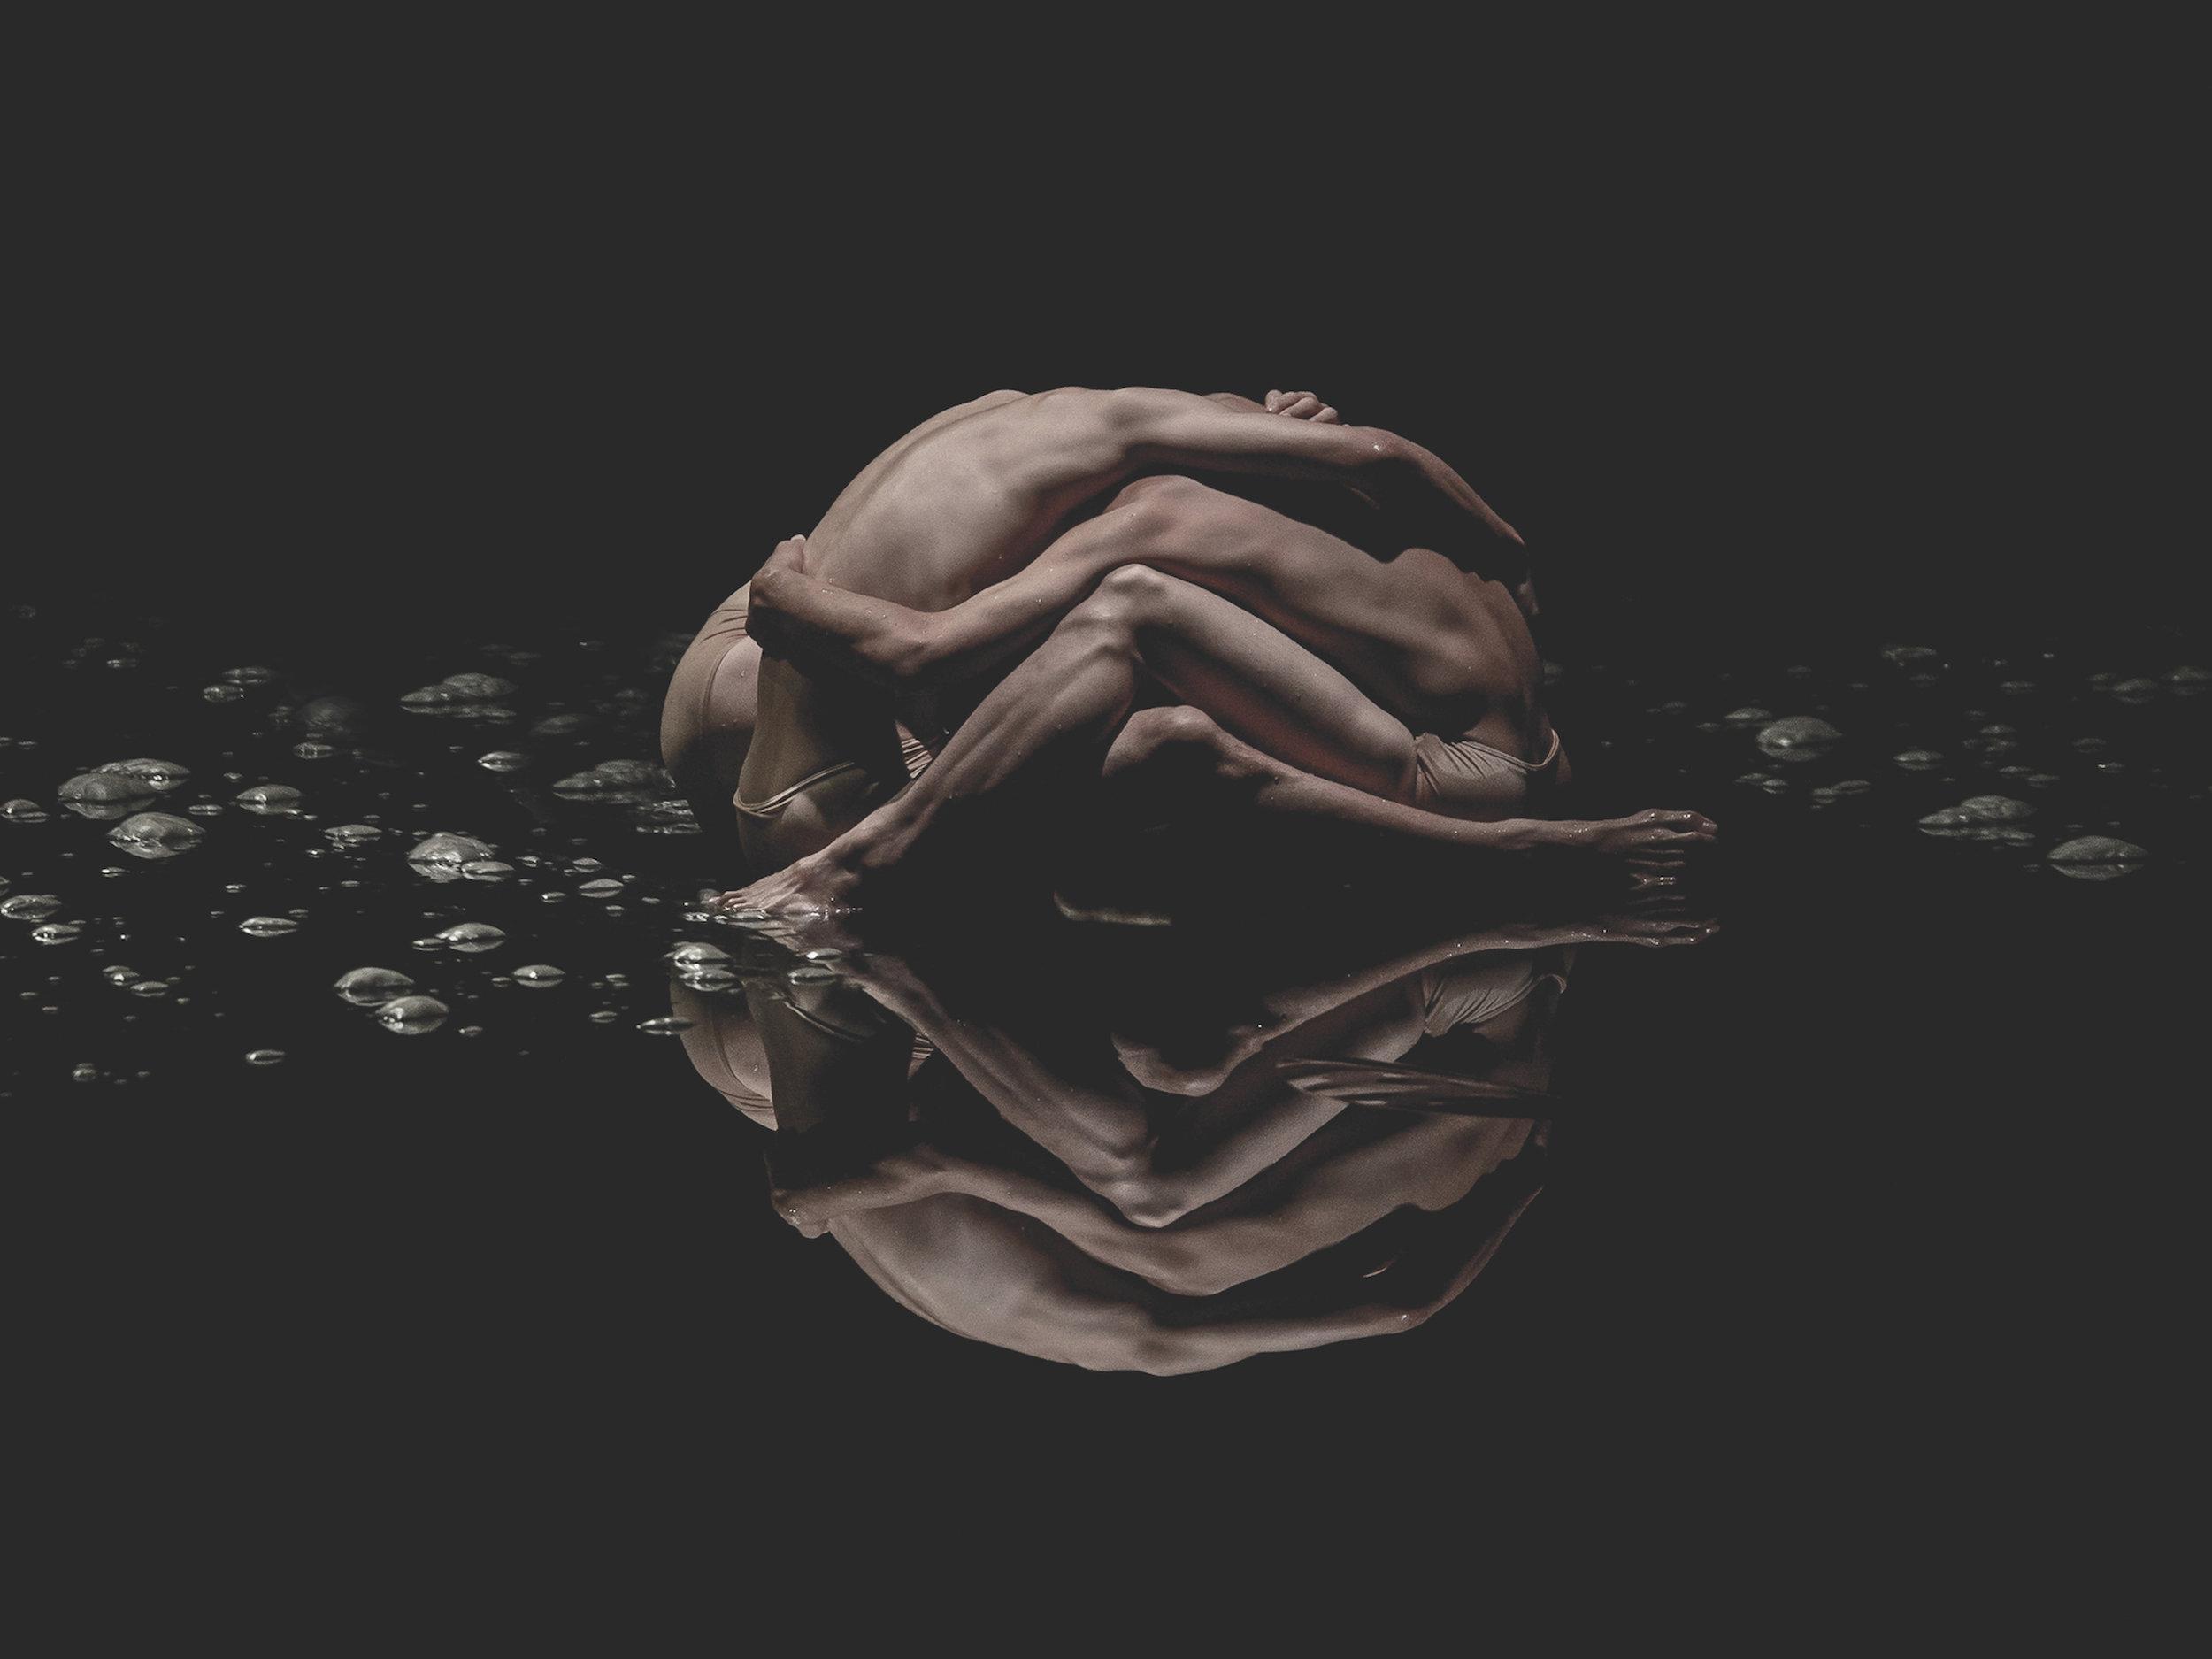 'Vessel' Damien Jalet